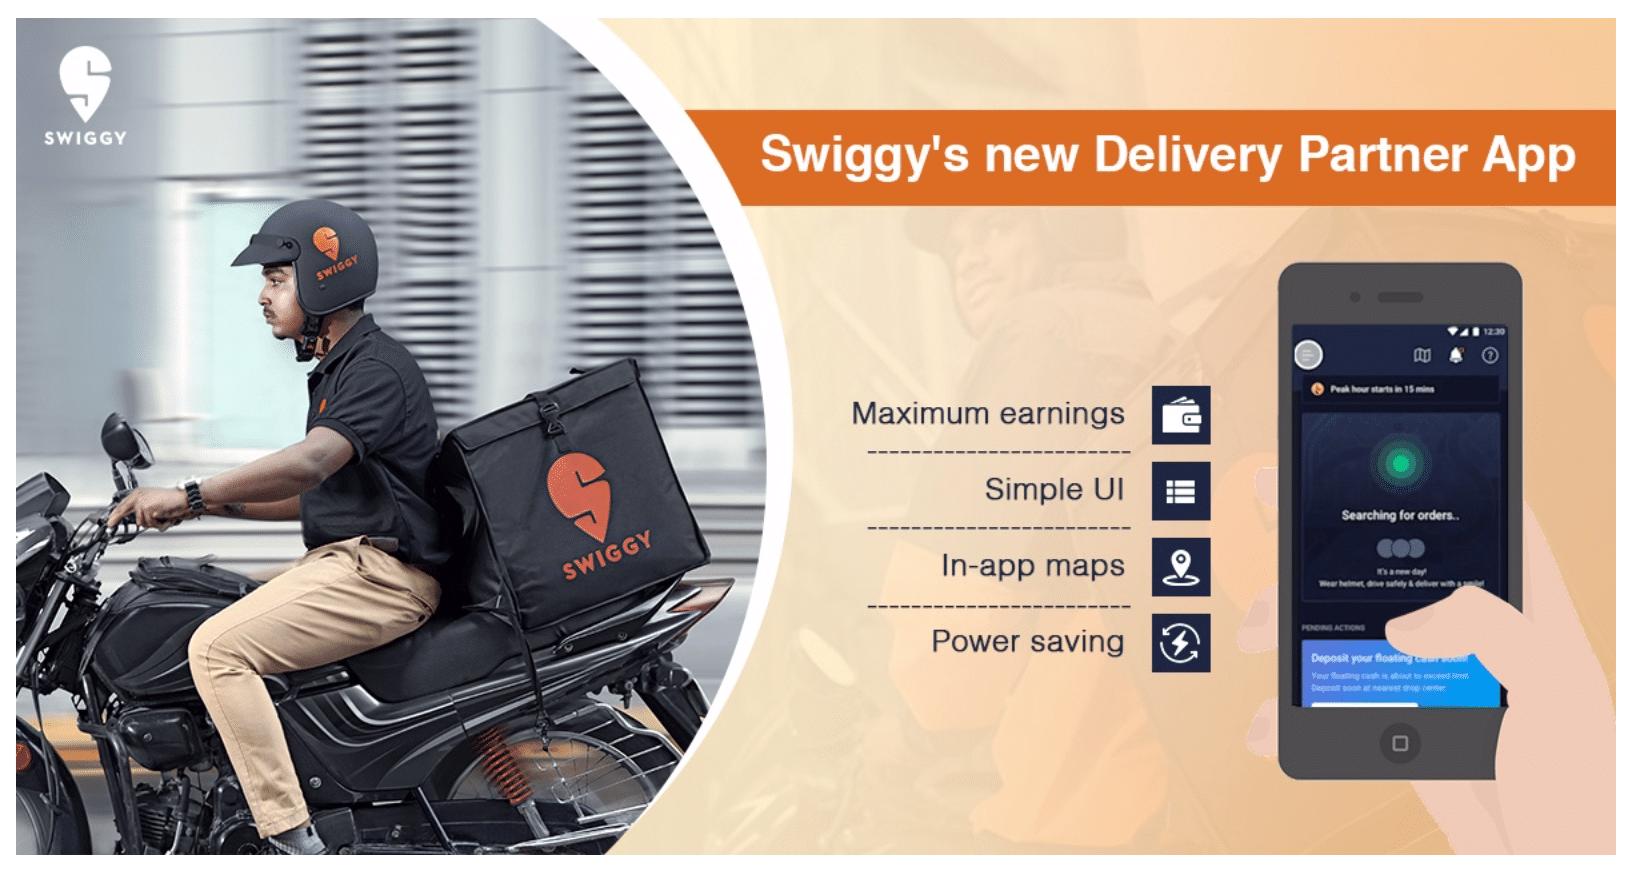 Swiggy Business Model | How does Swiggy make money